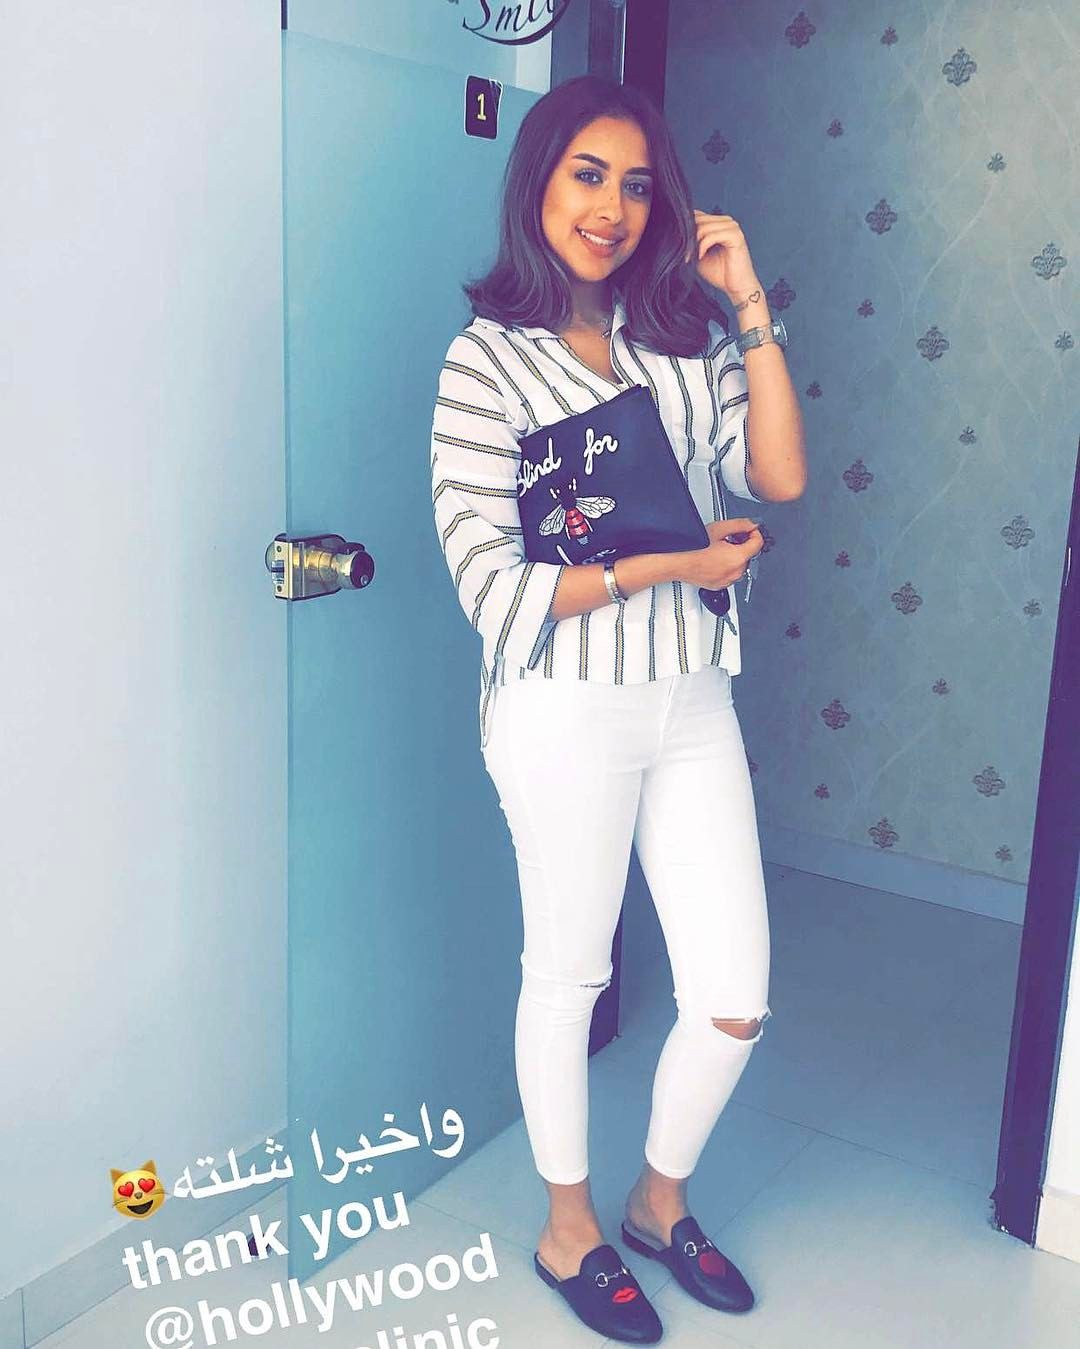 12 8k Likes 473 Comments فرح الهادي Farah Alhady On Instagram واخيرا شلت التقويم بعد سنتين ونص ثانكيو عيادة هوليوود سما Fashion Outfits Farah